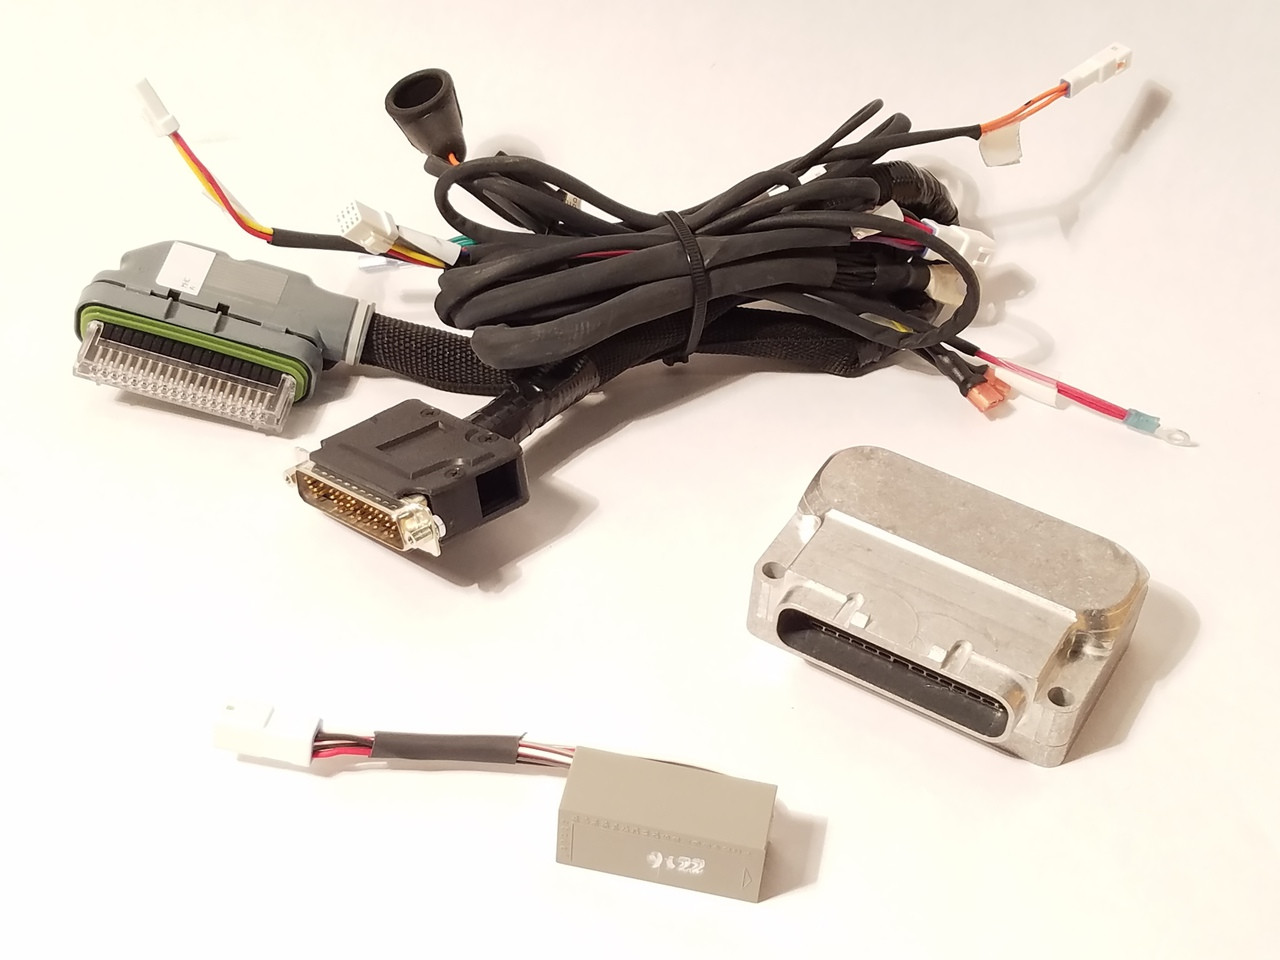 2005 big dog bulldog wiring diagram 1974 mg midget 08 ehc replacement system all carb models w stock